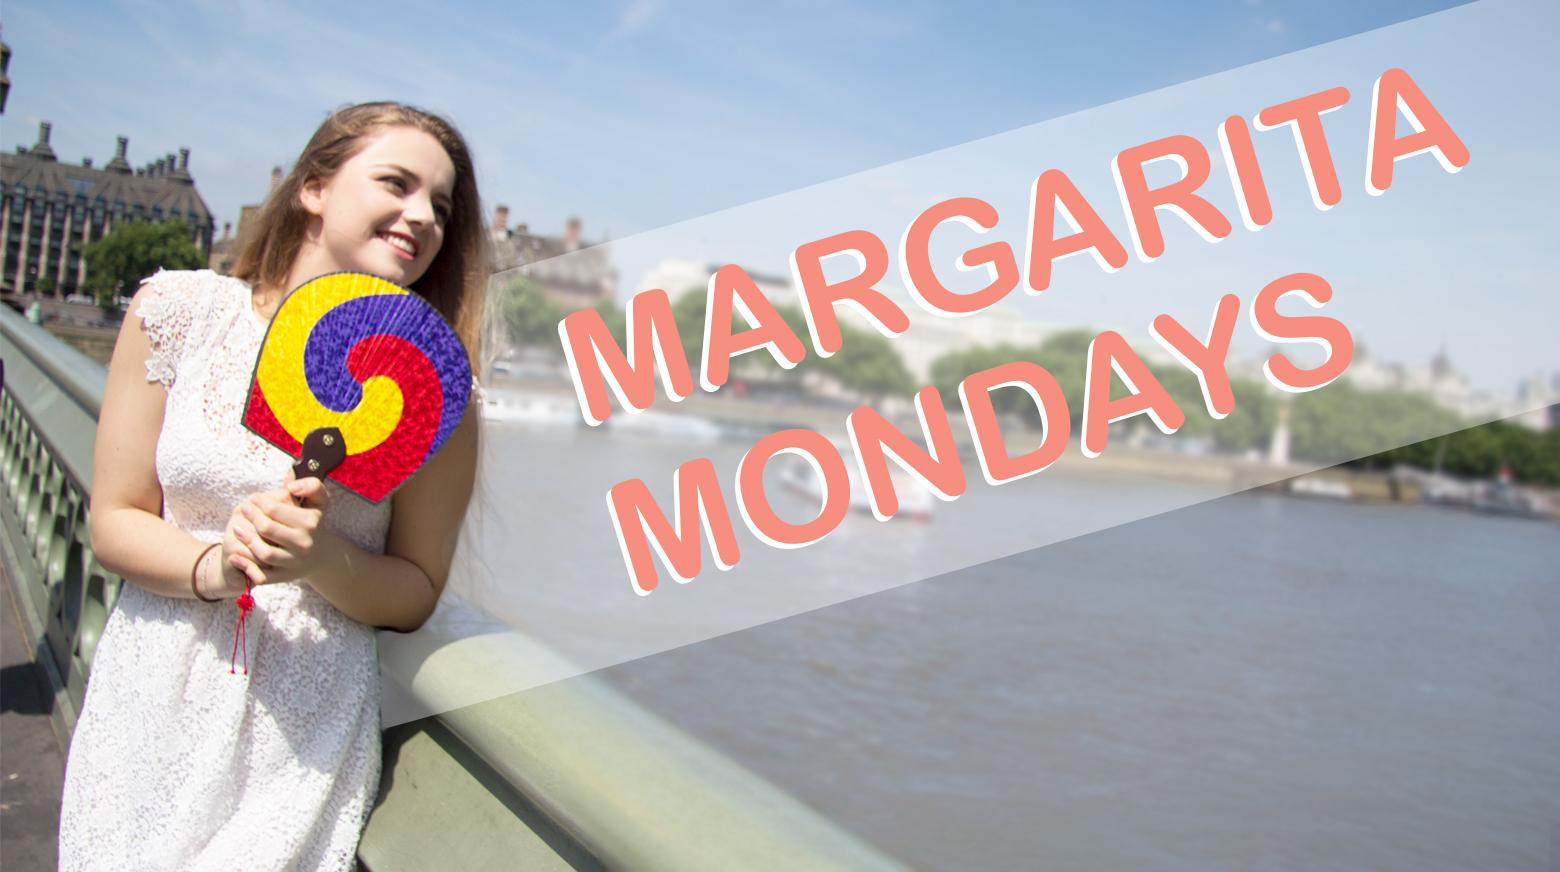 Margarita Mondays